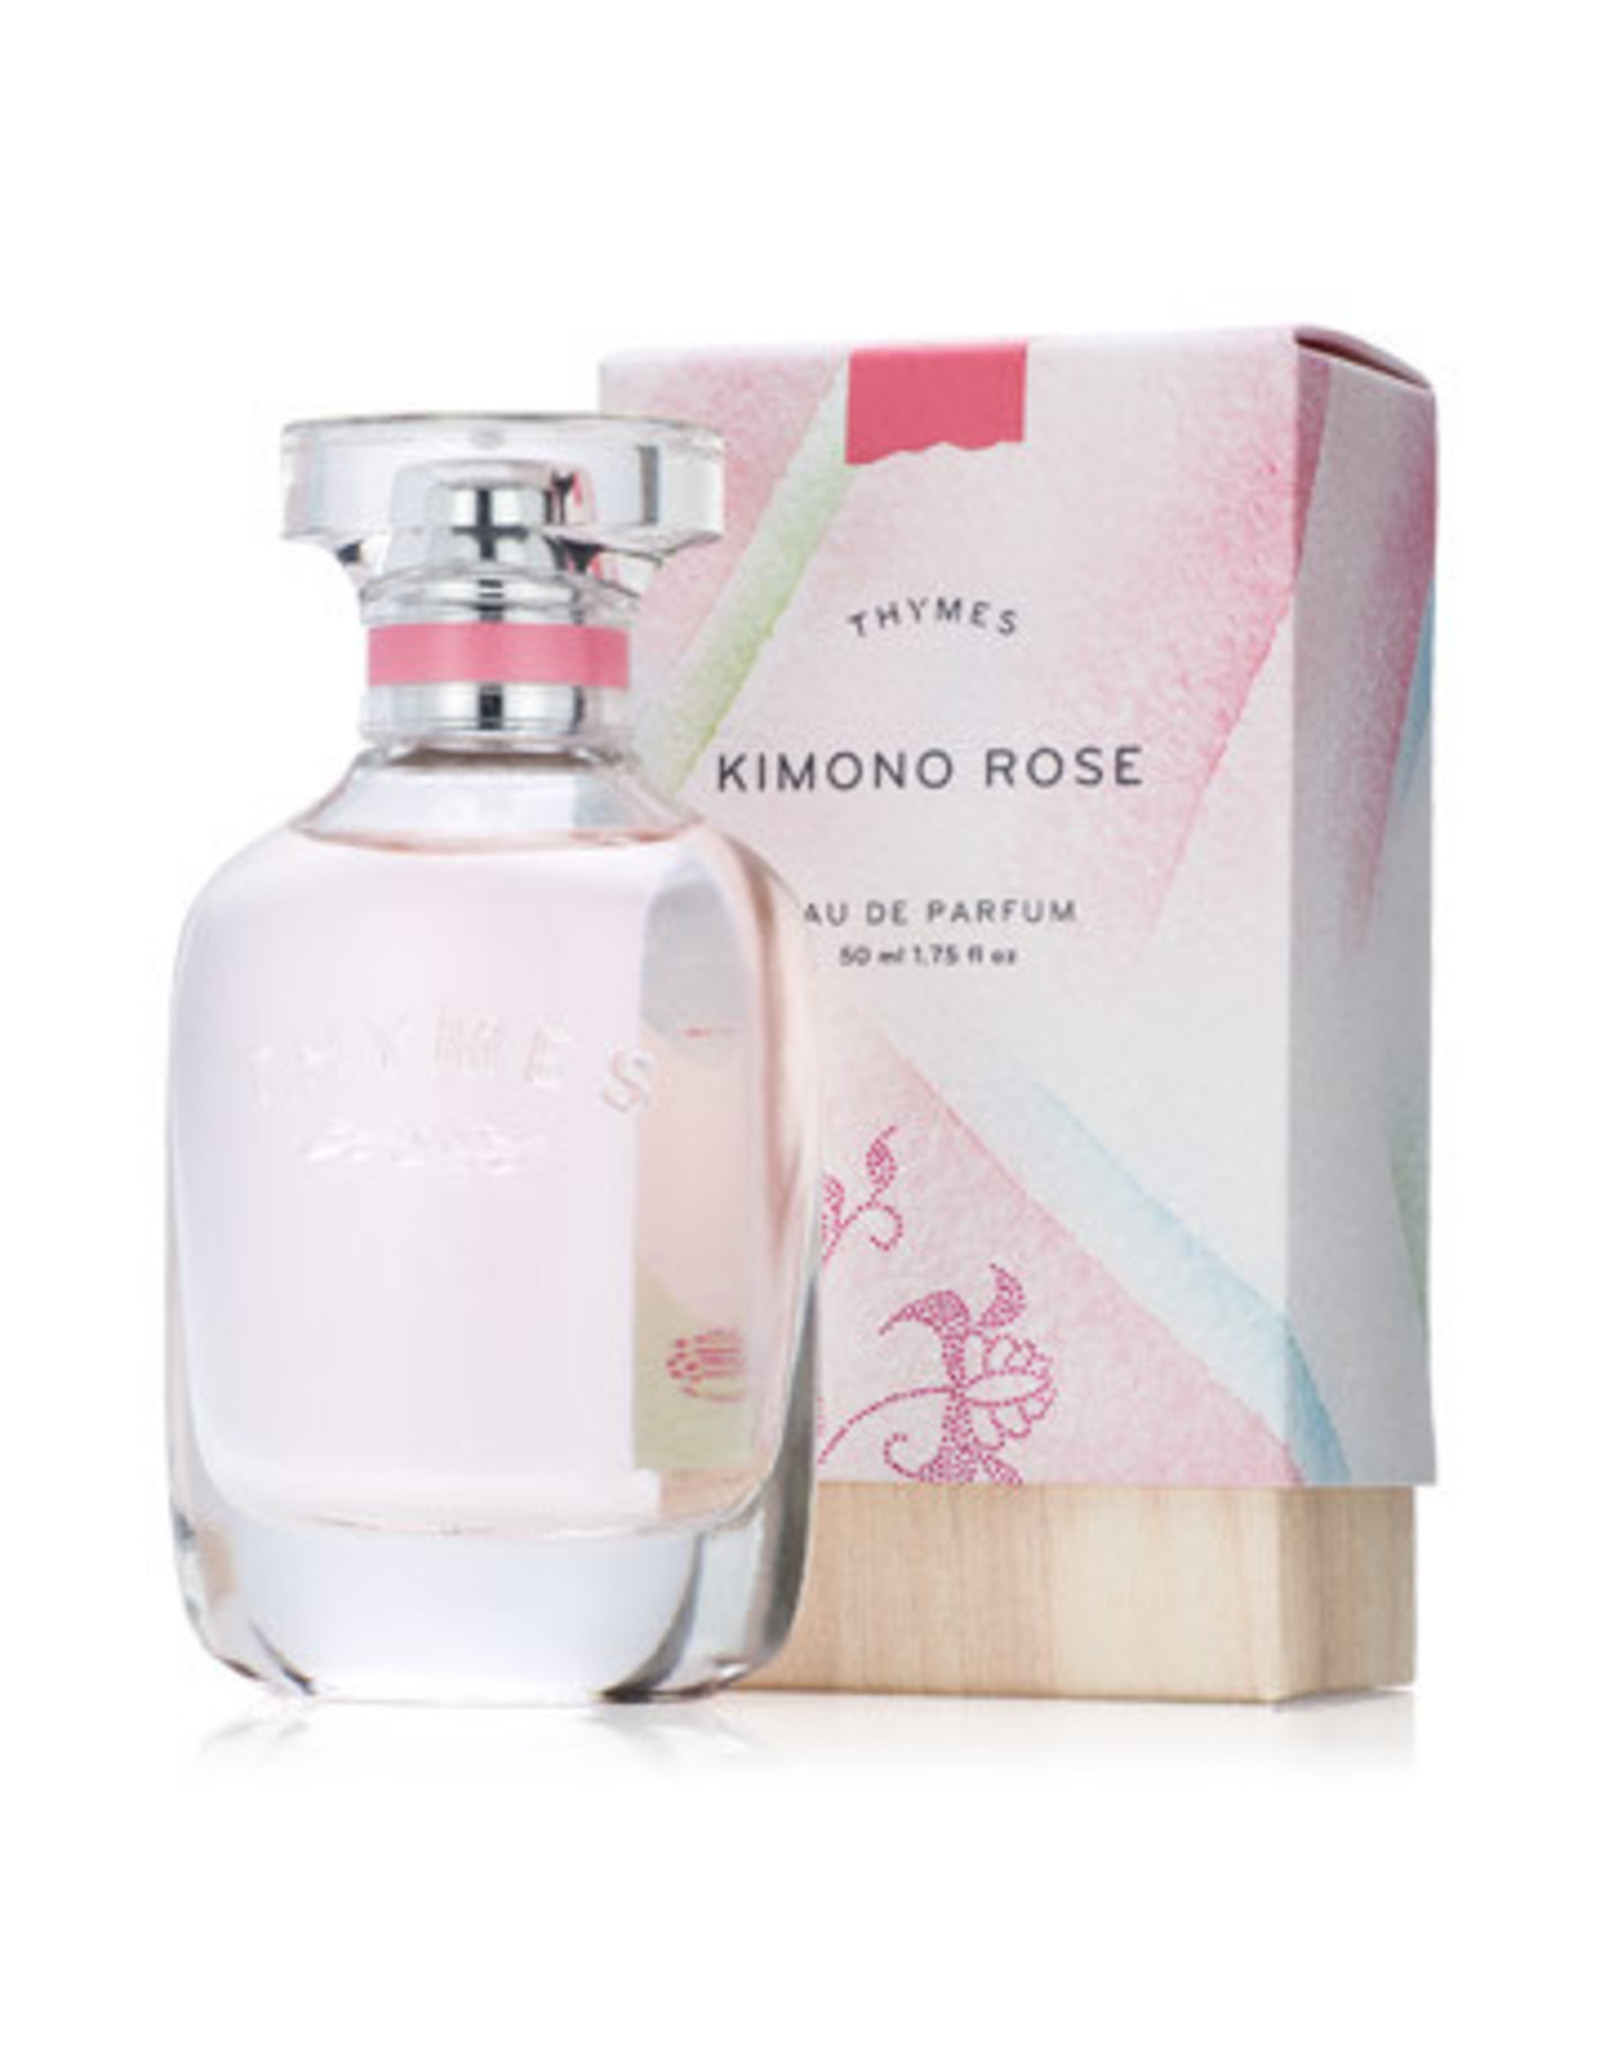 Thymes Thymes Kimono Rose Eau de Parfum Bottle